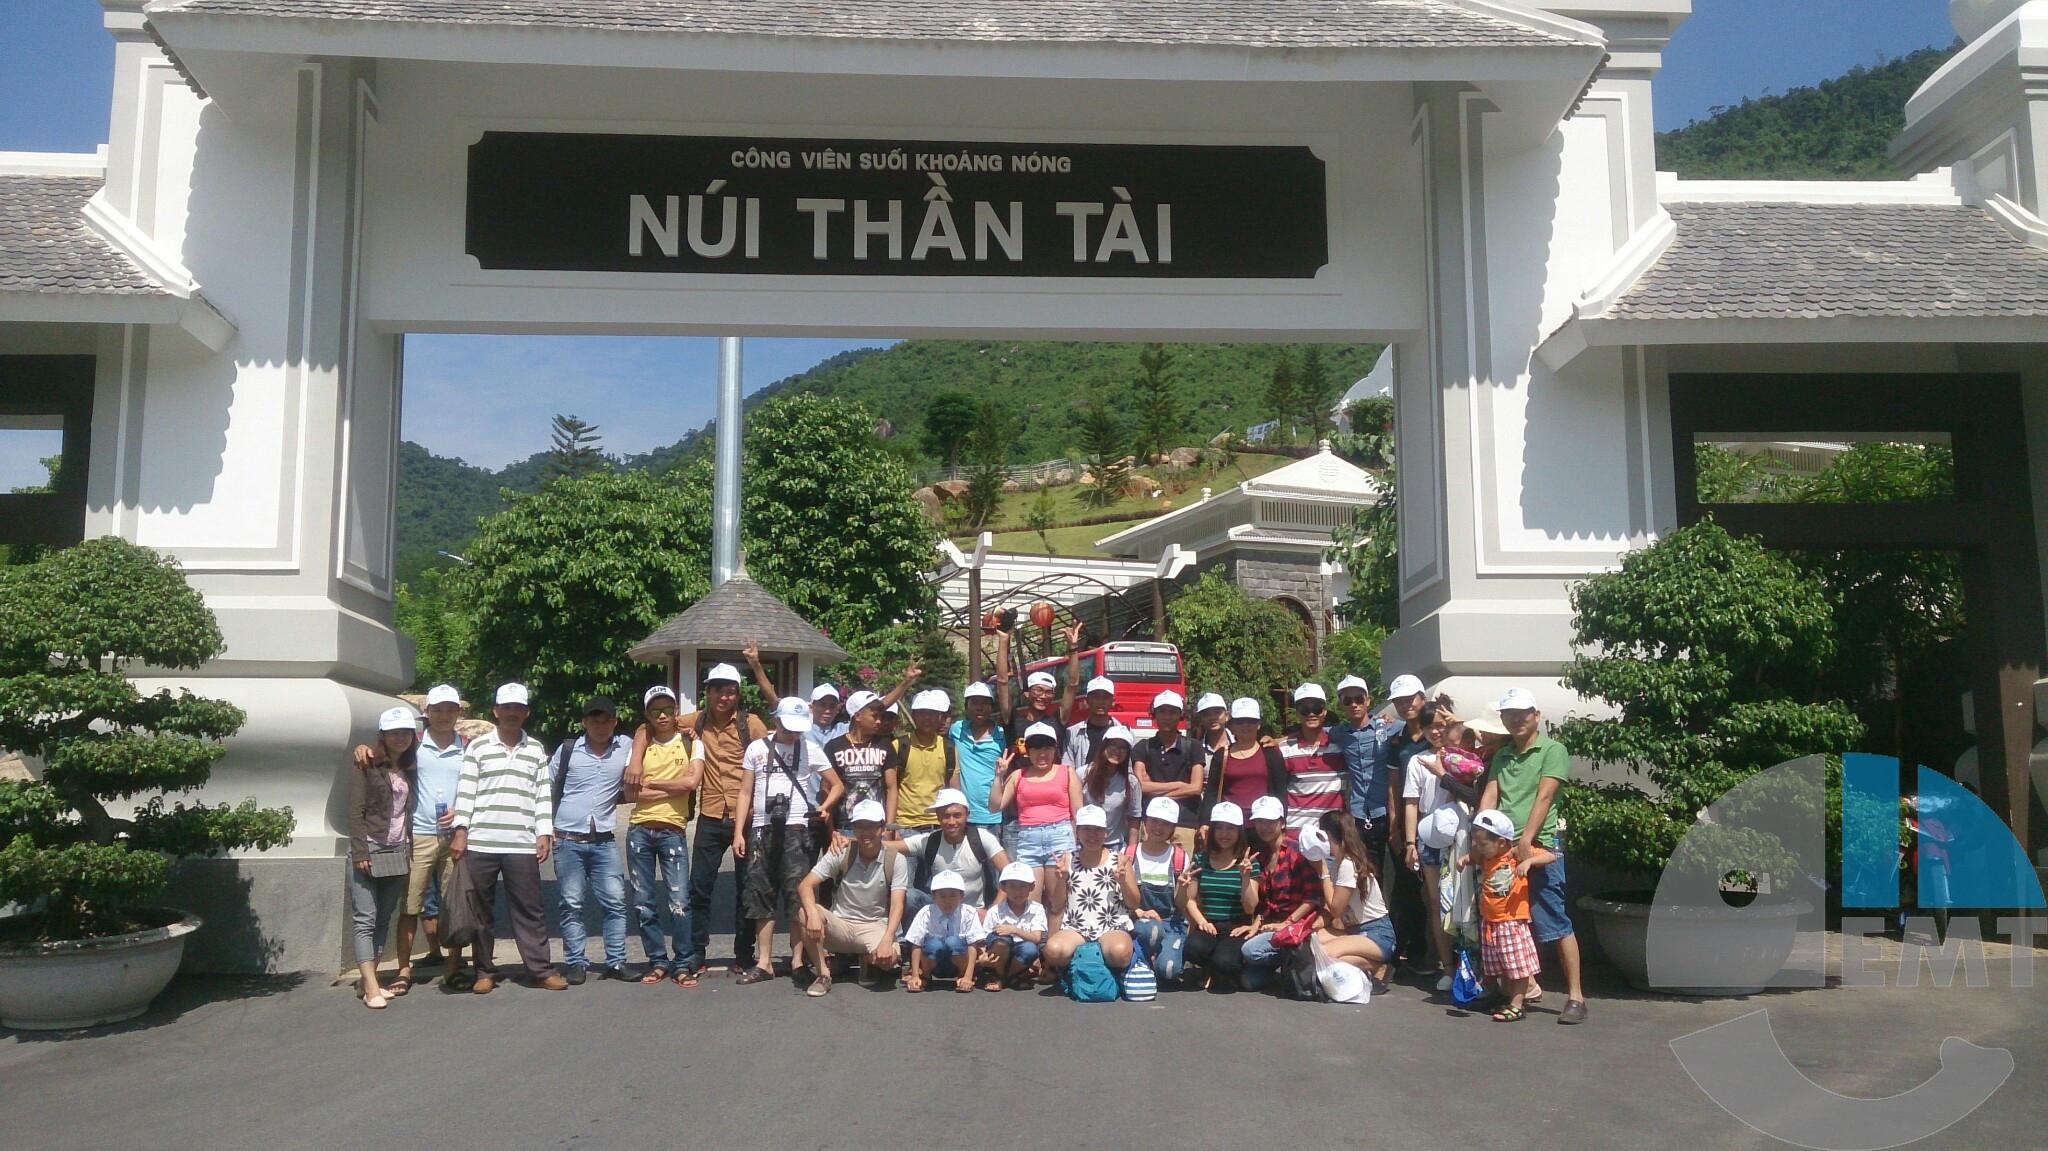 nui-than-tai-elephant-tour